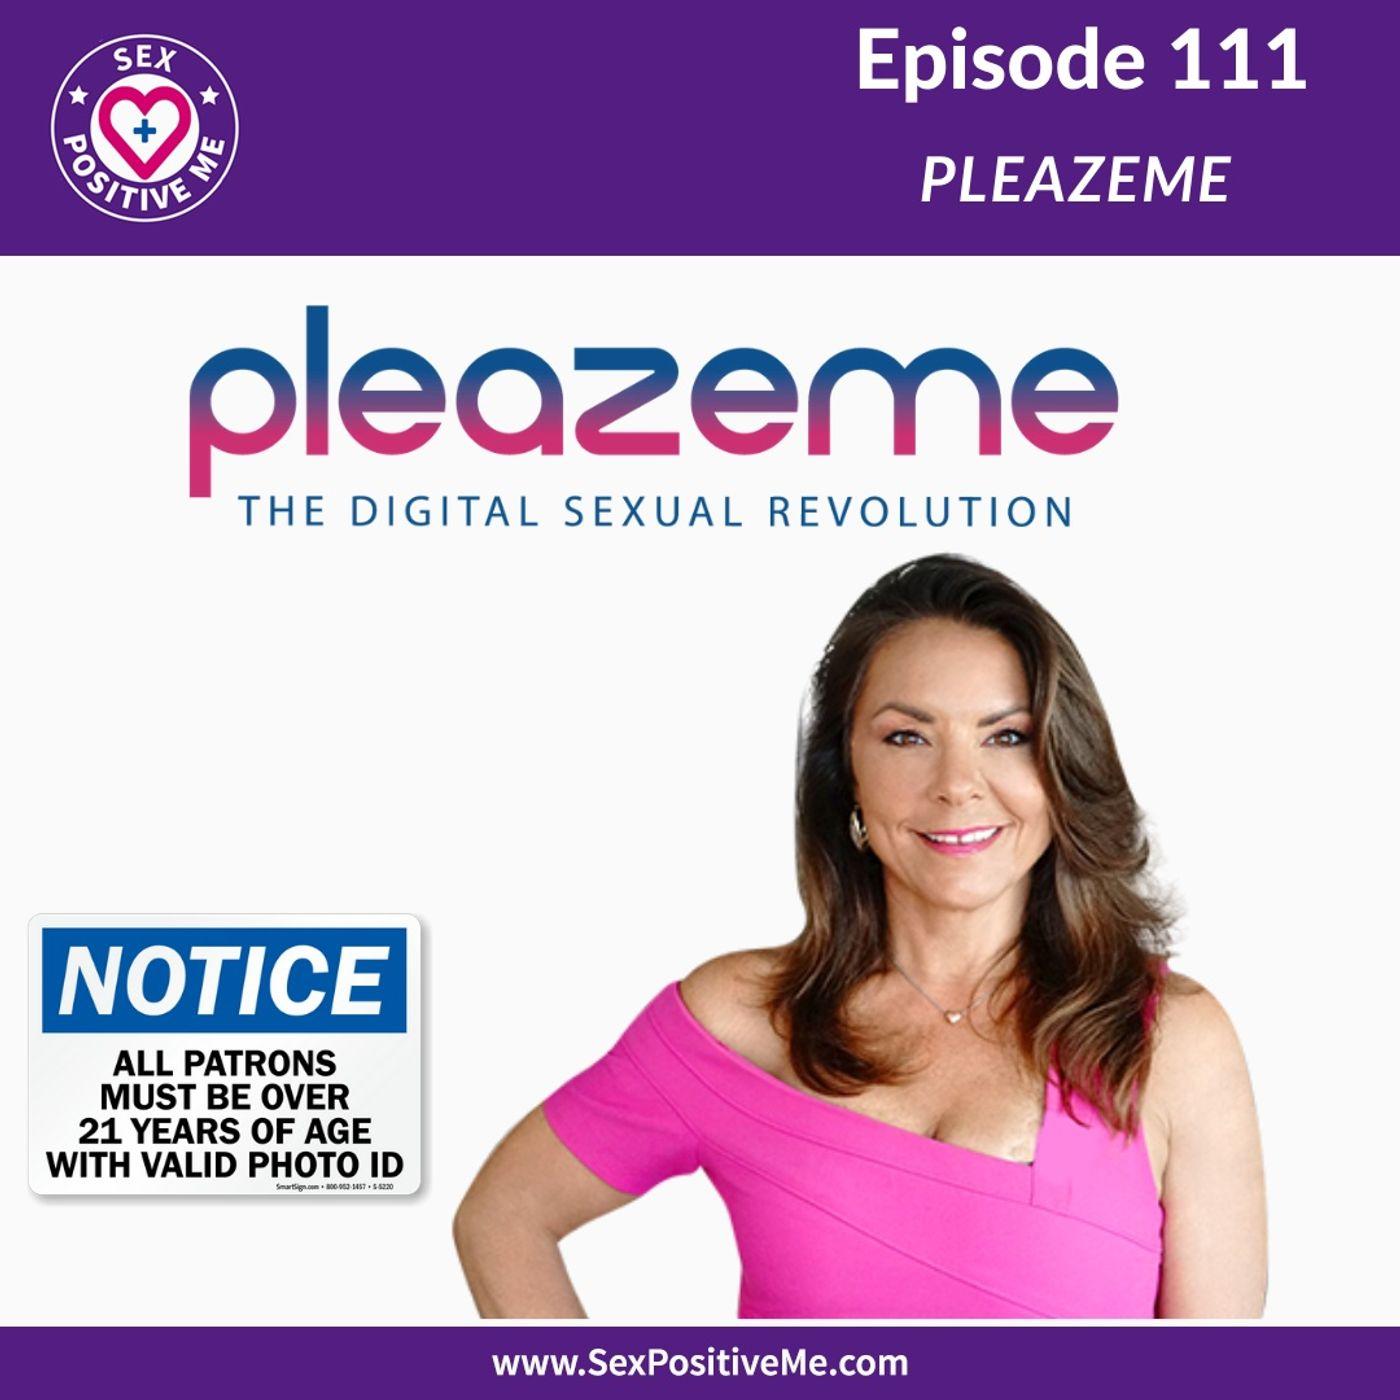 Sex Positive Me - E111 PleazeMe